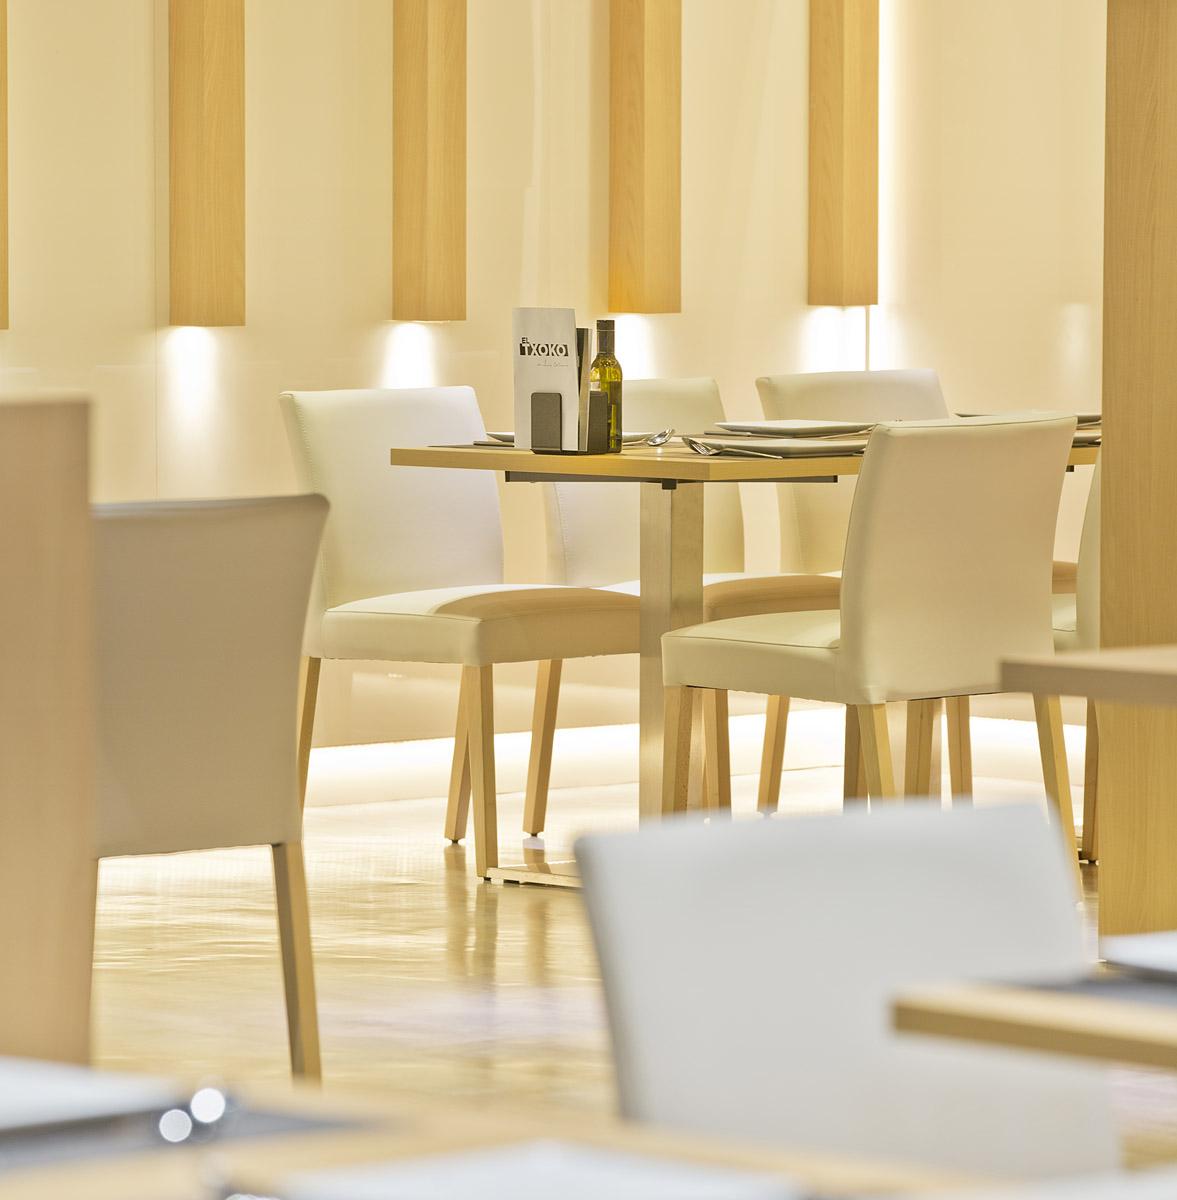 El Txoko Restaurant, El Corte Ingles, Marina Banis, Costa Marbella Shopping